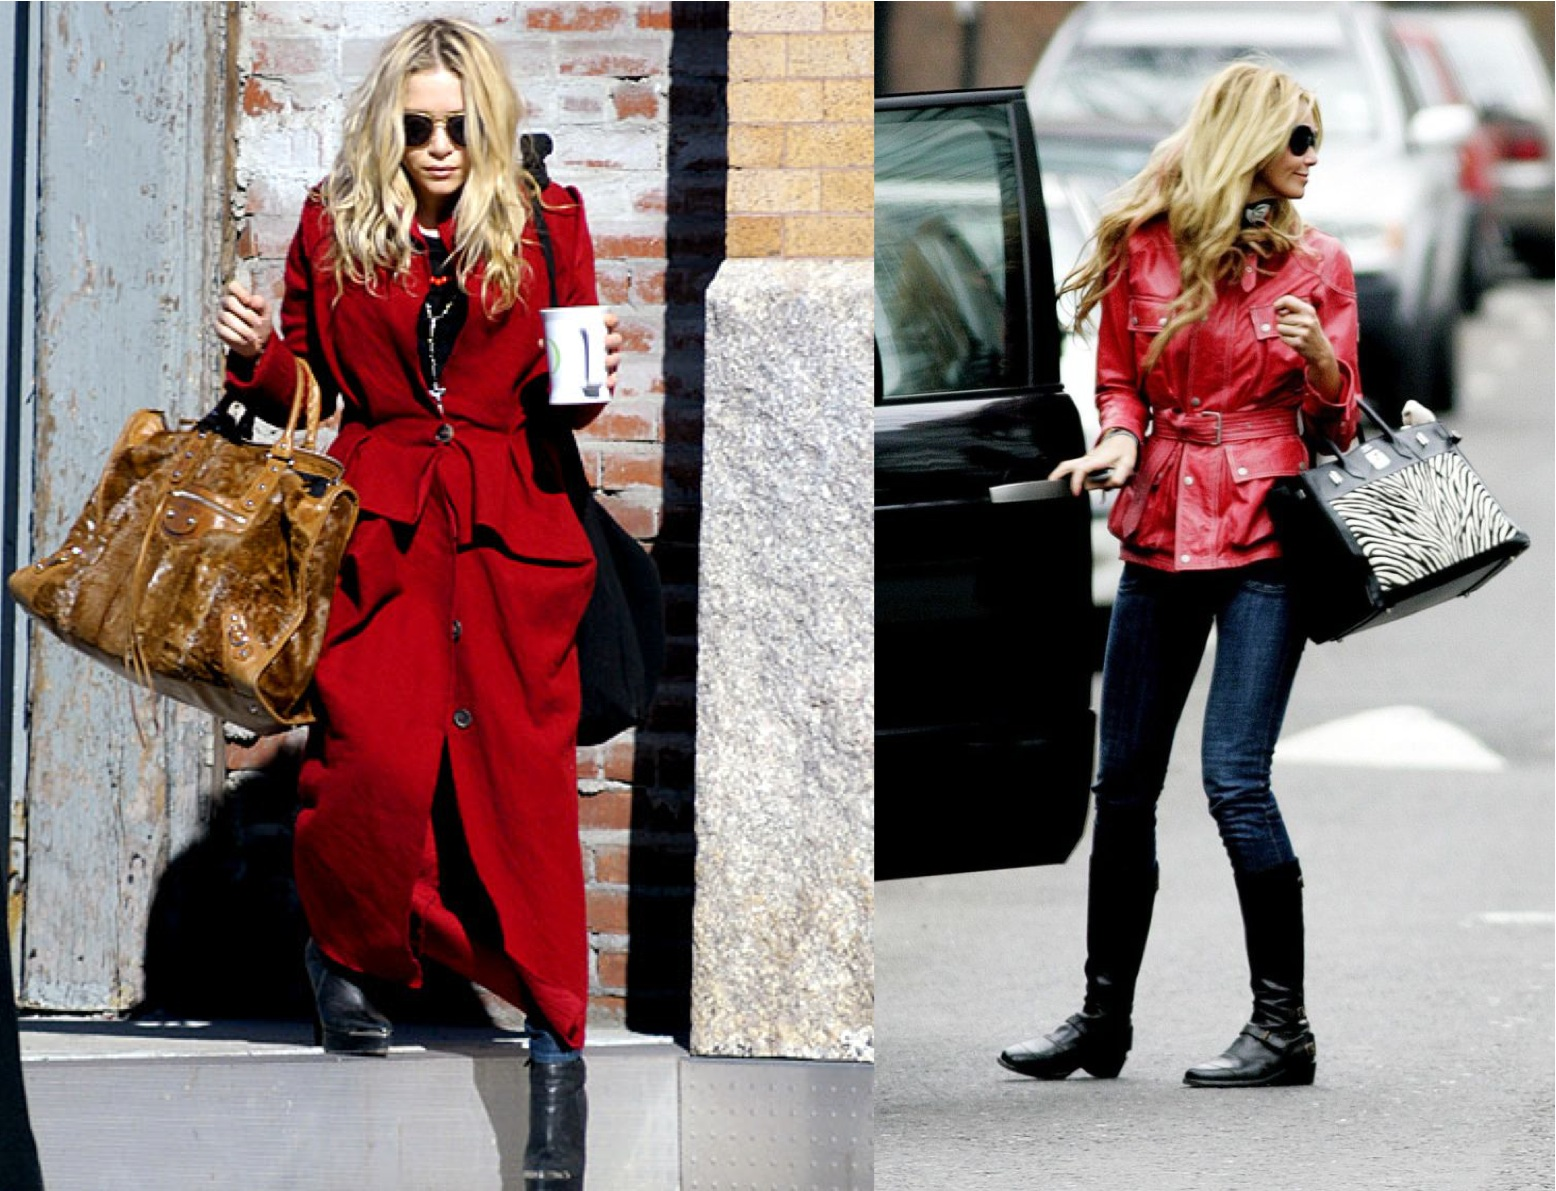 http://3.bp.blogspot.com/_PfmV3qvy8FY/TRu-Rlf2_4I/AAAAAAAAAqI/mr87V5Gwl74/s1600/la+modella+mafia+Mary+kate+Olsen+%2526+Elle+Mcpherson+in+red.jpg